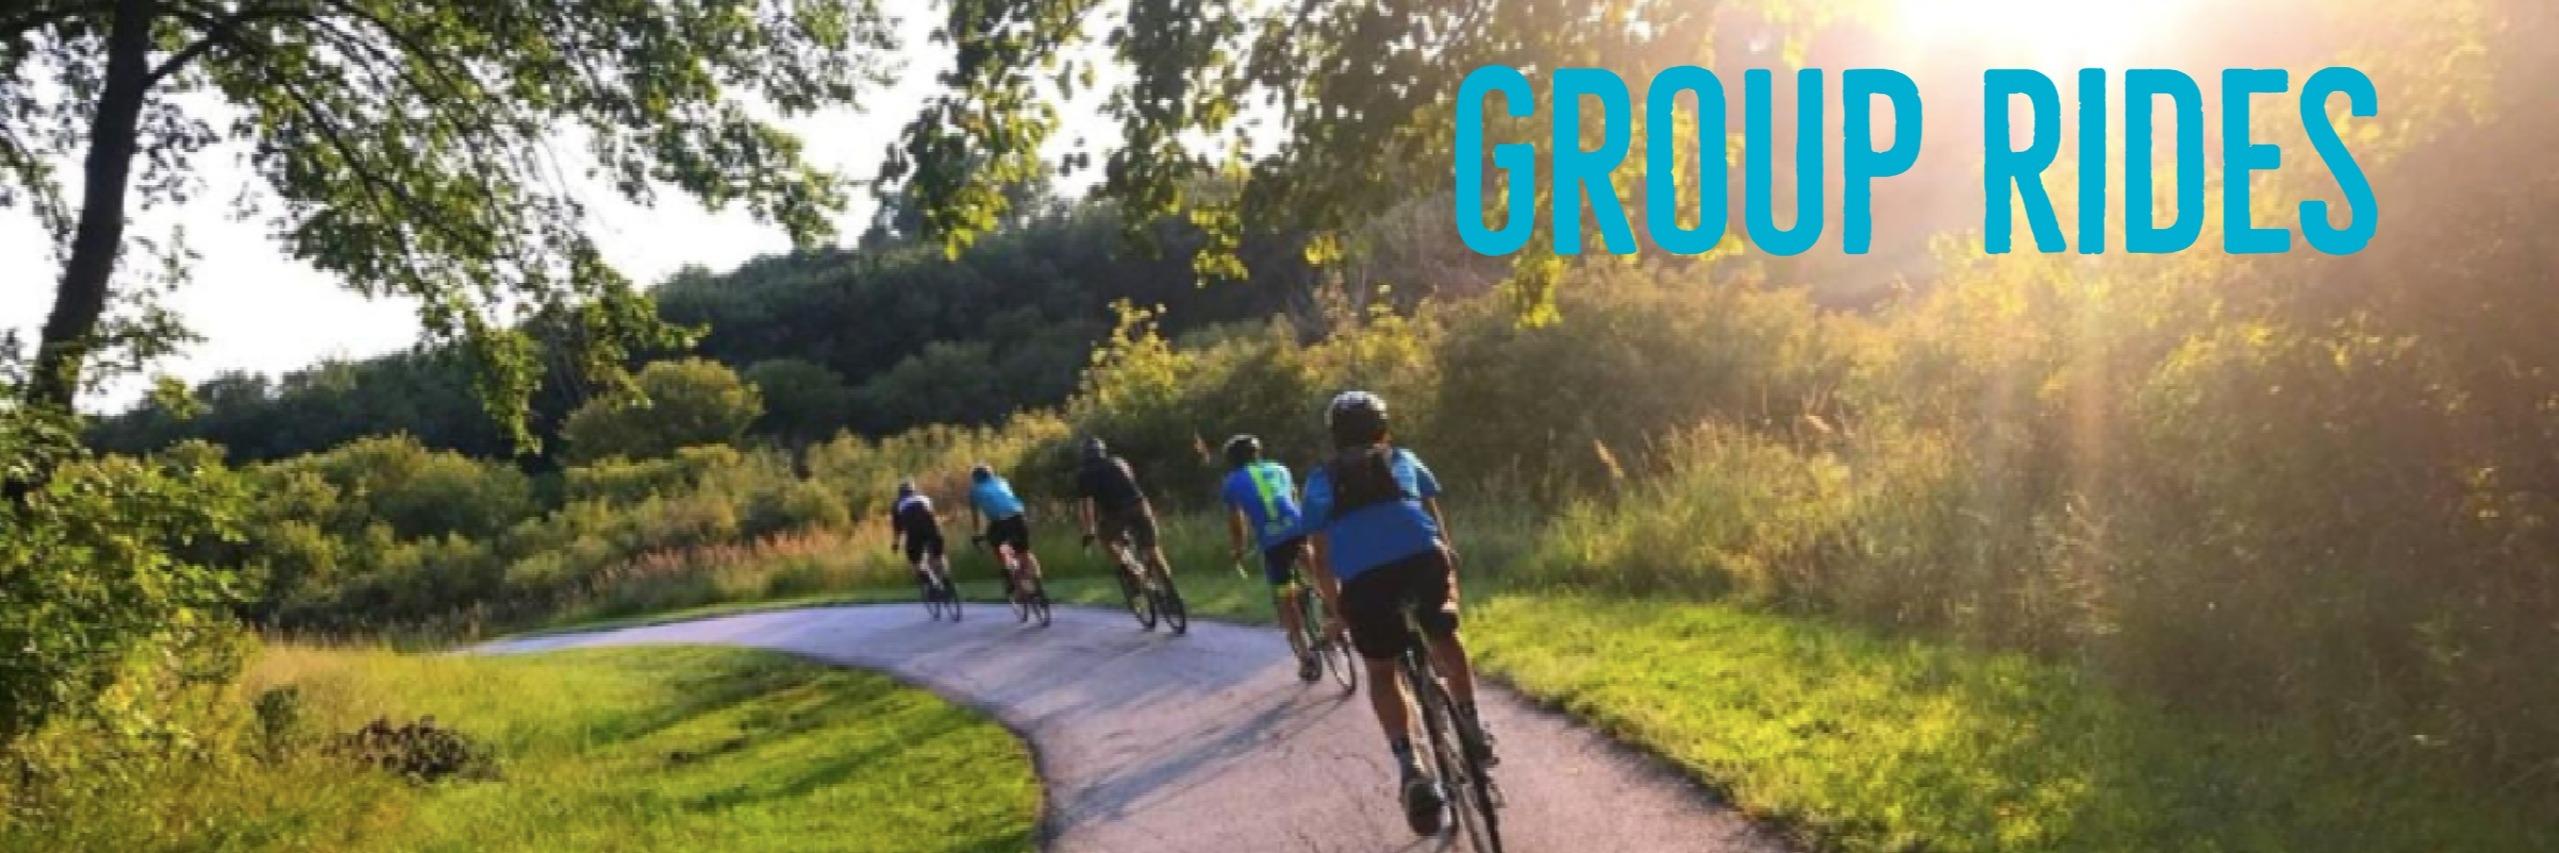 Group rides - Omaha, NE